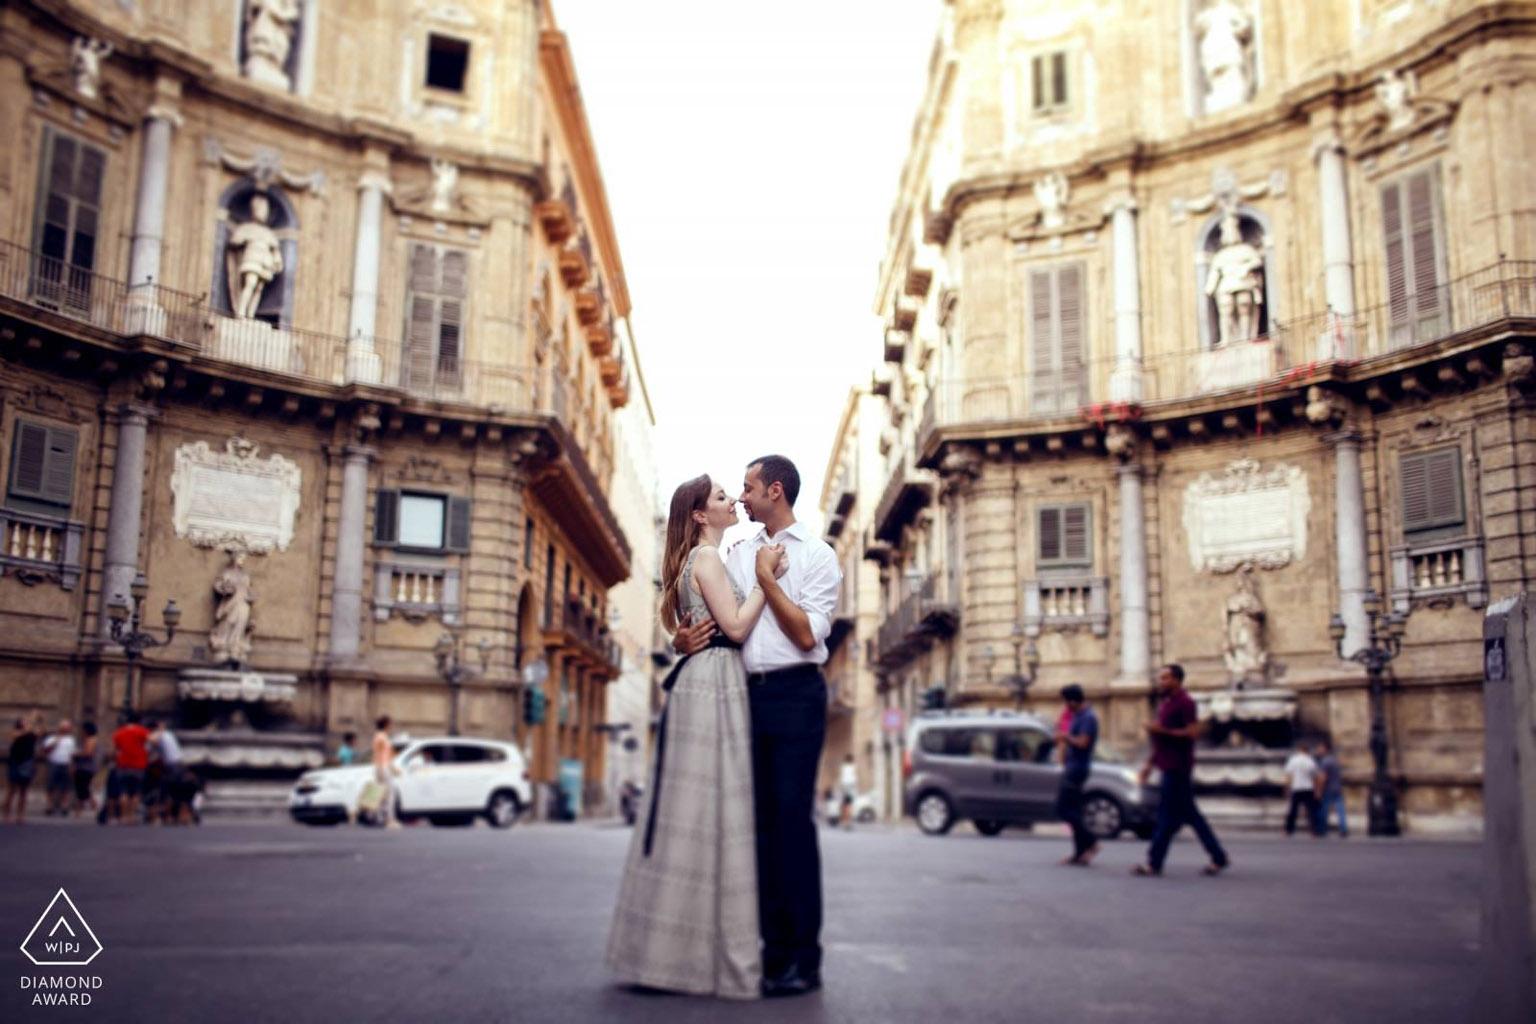 Diamond Award for Nino Lombardo Sicily Photographer